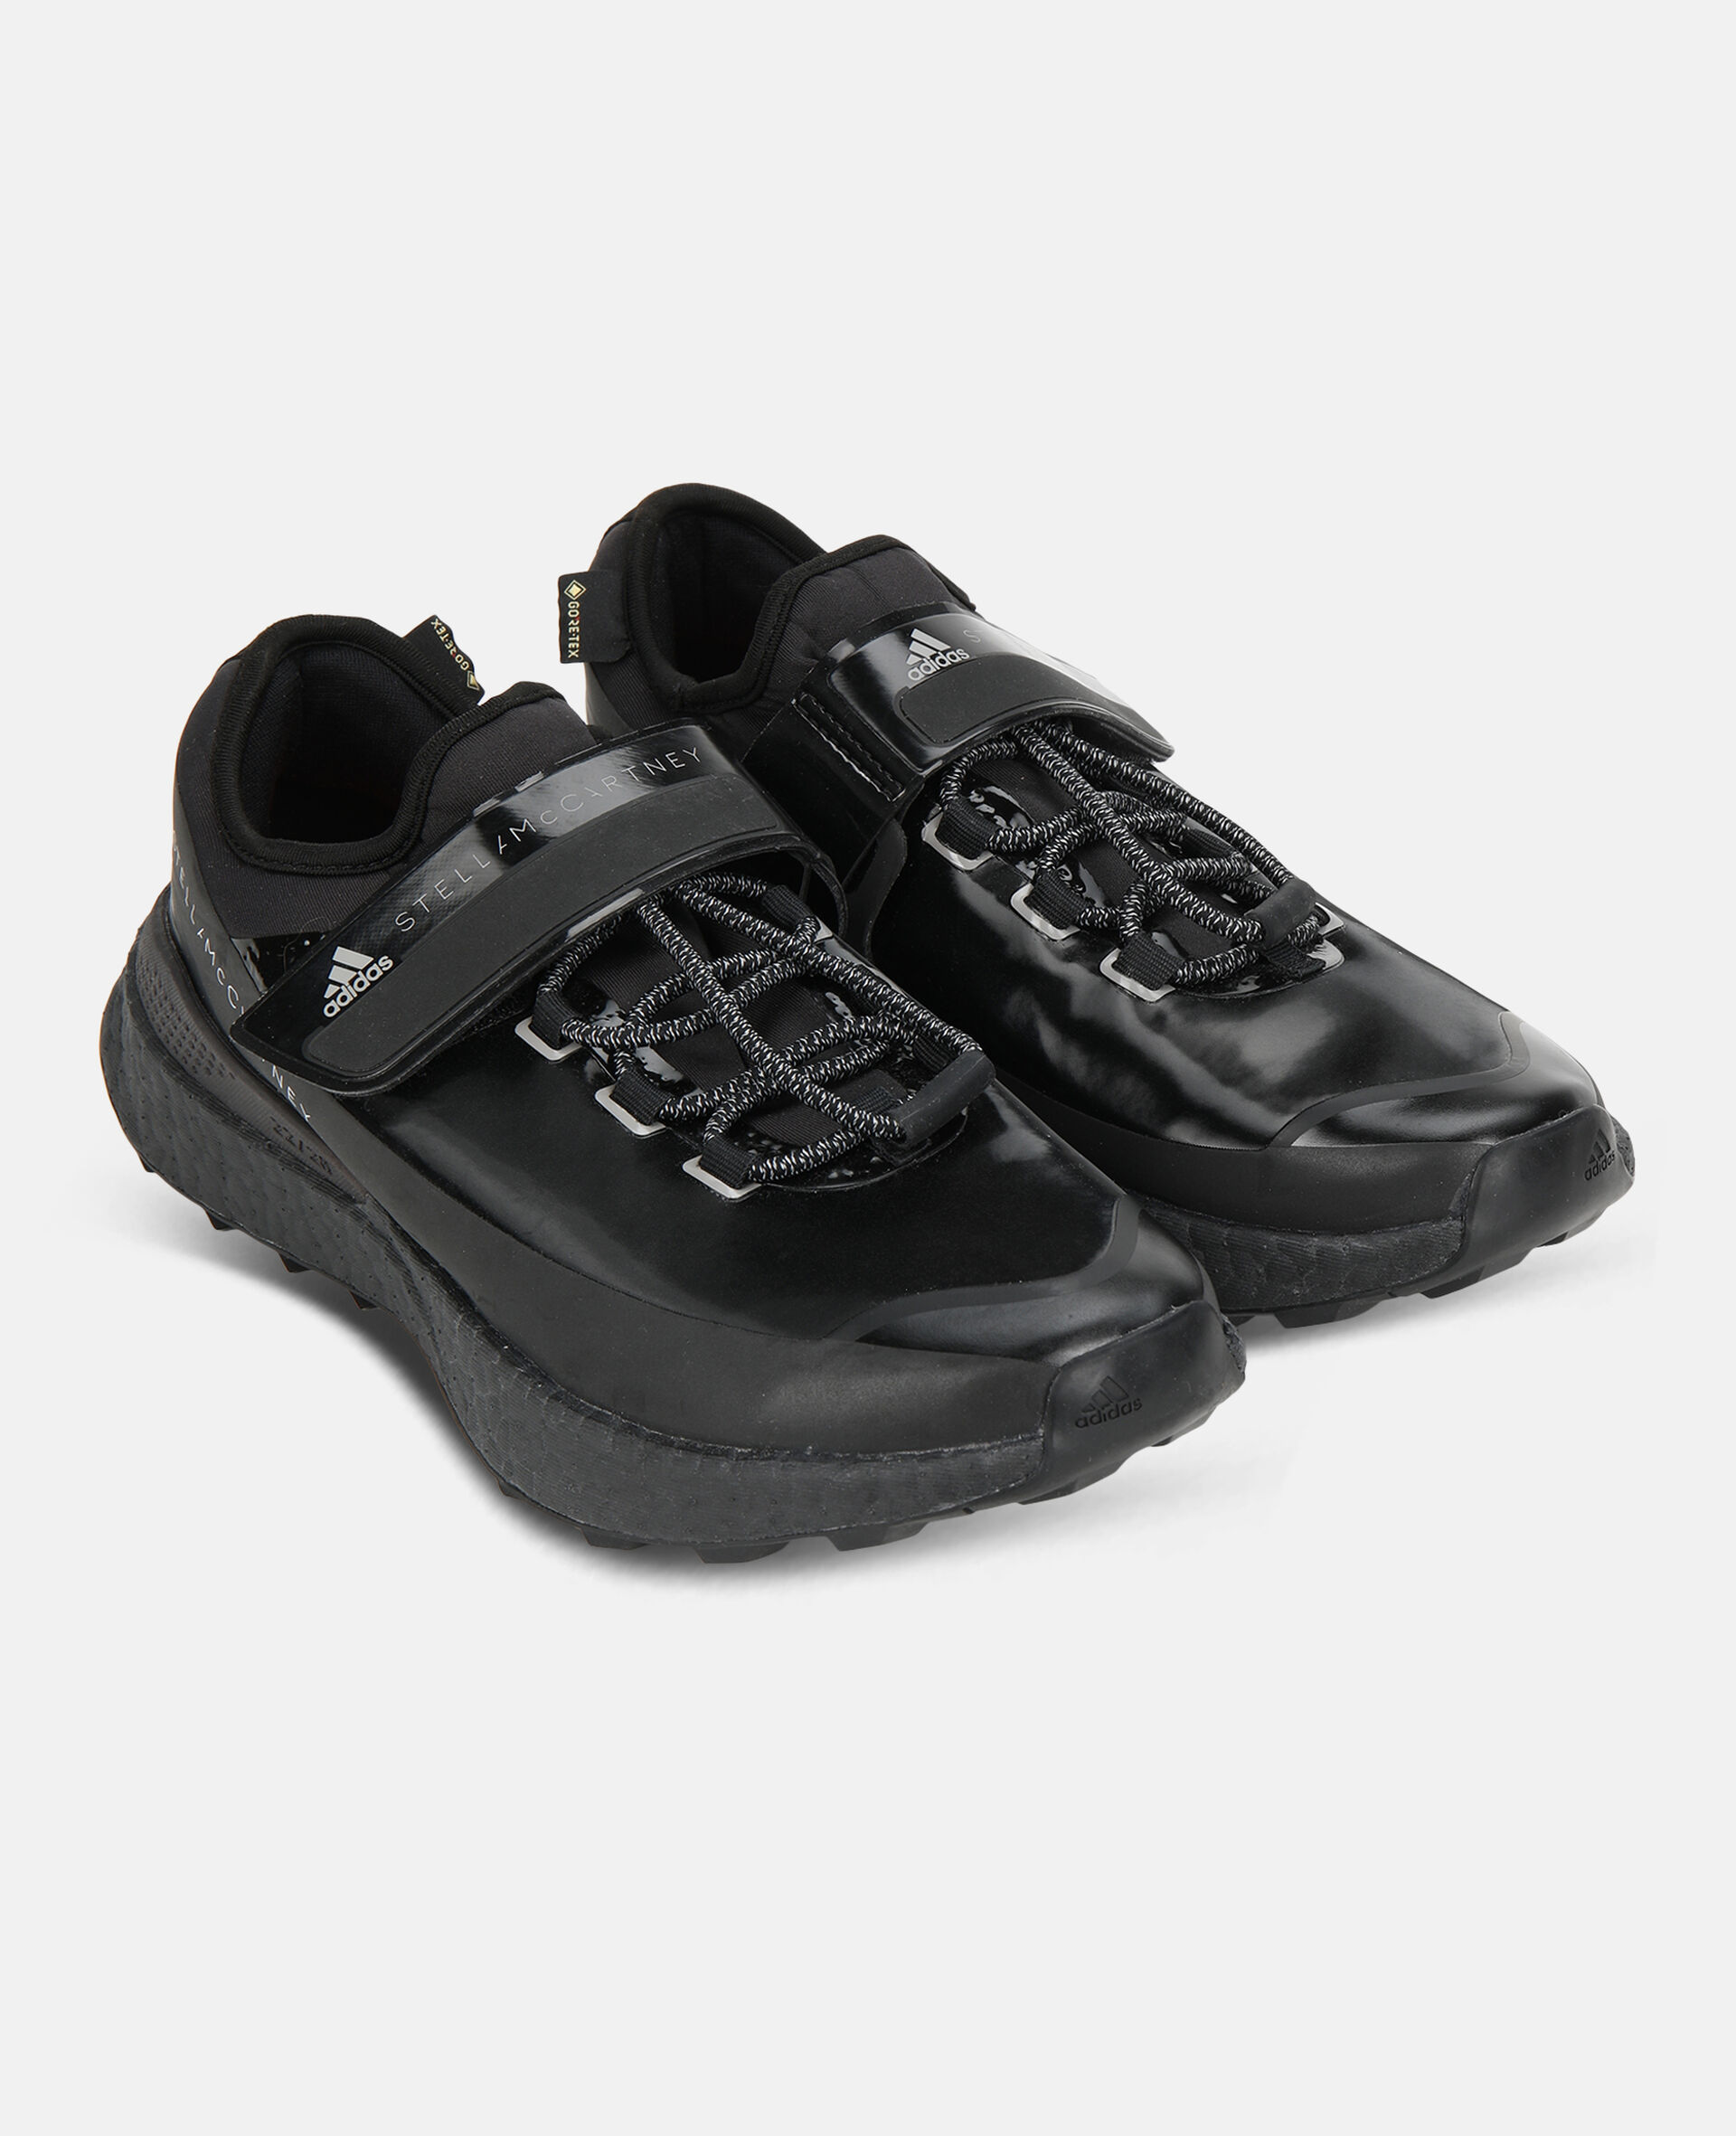 Chaussures de running Outdoor Boost rain.rdy noires -Noir-large image number 1